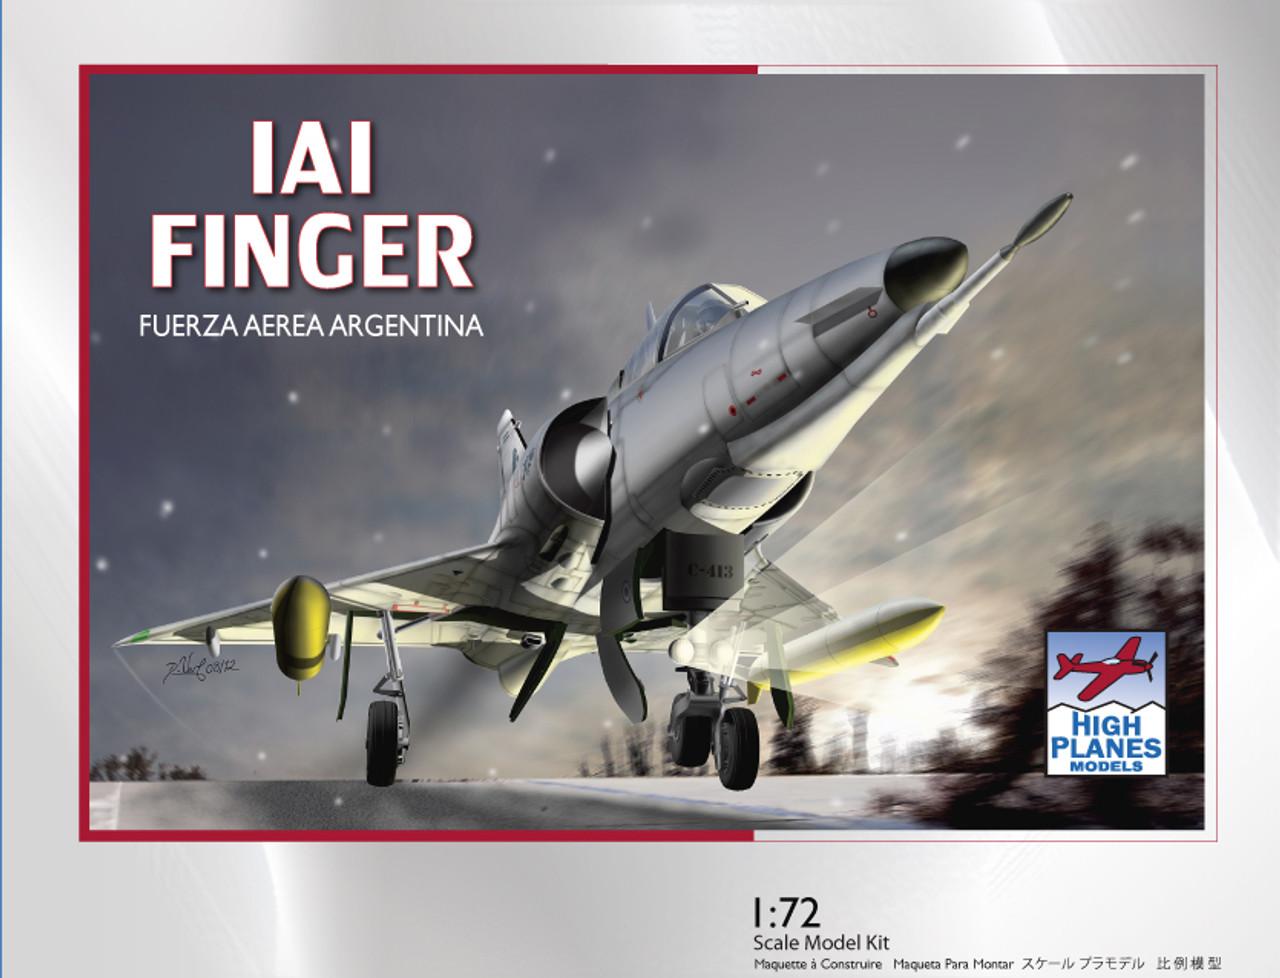 High Planes IAI Finger